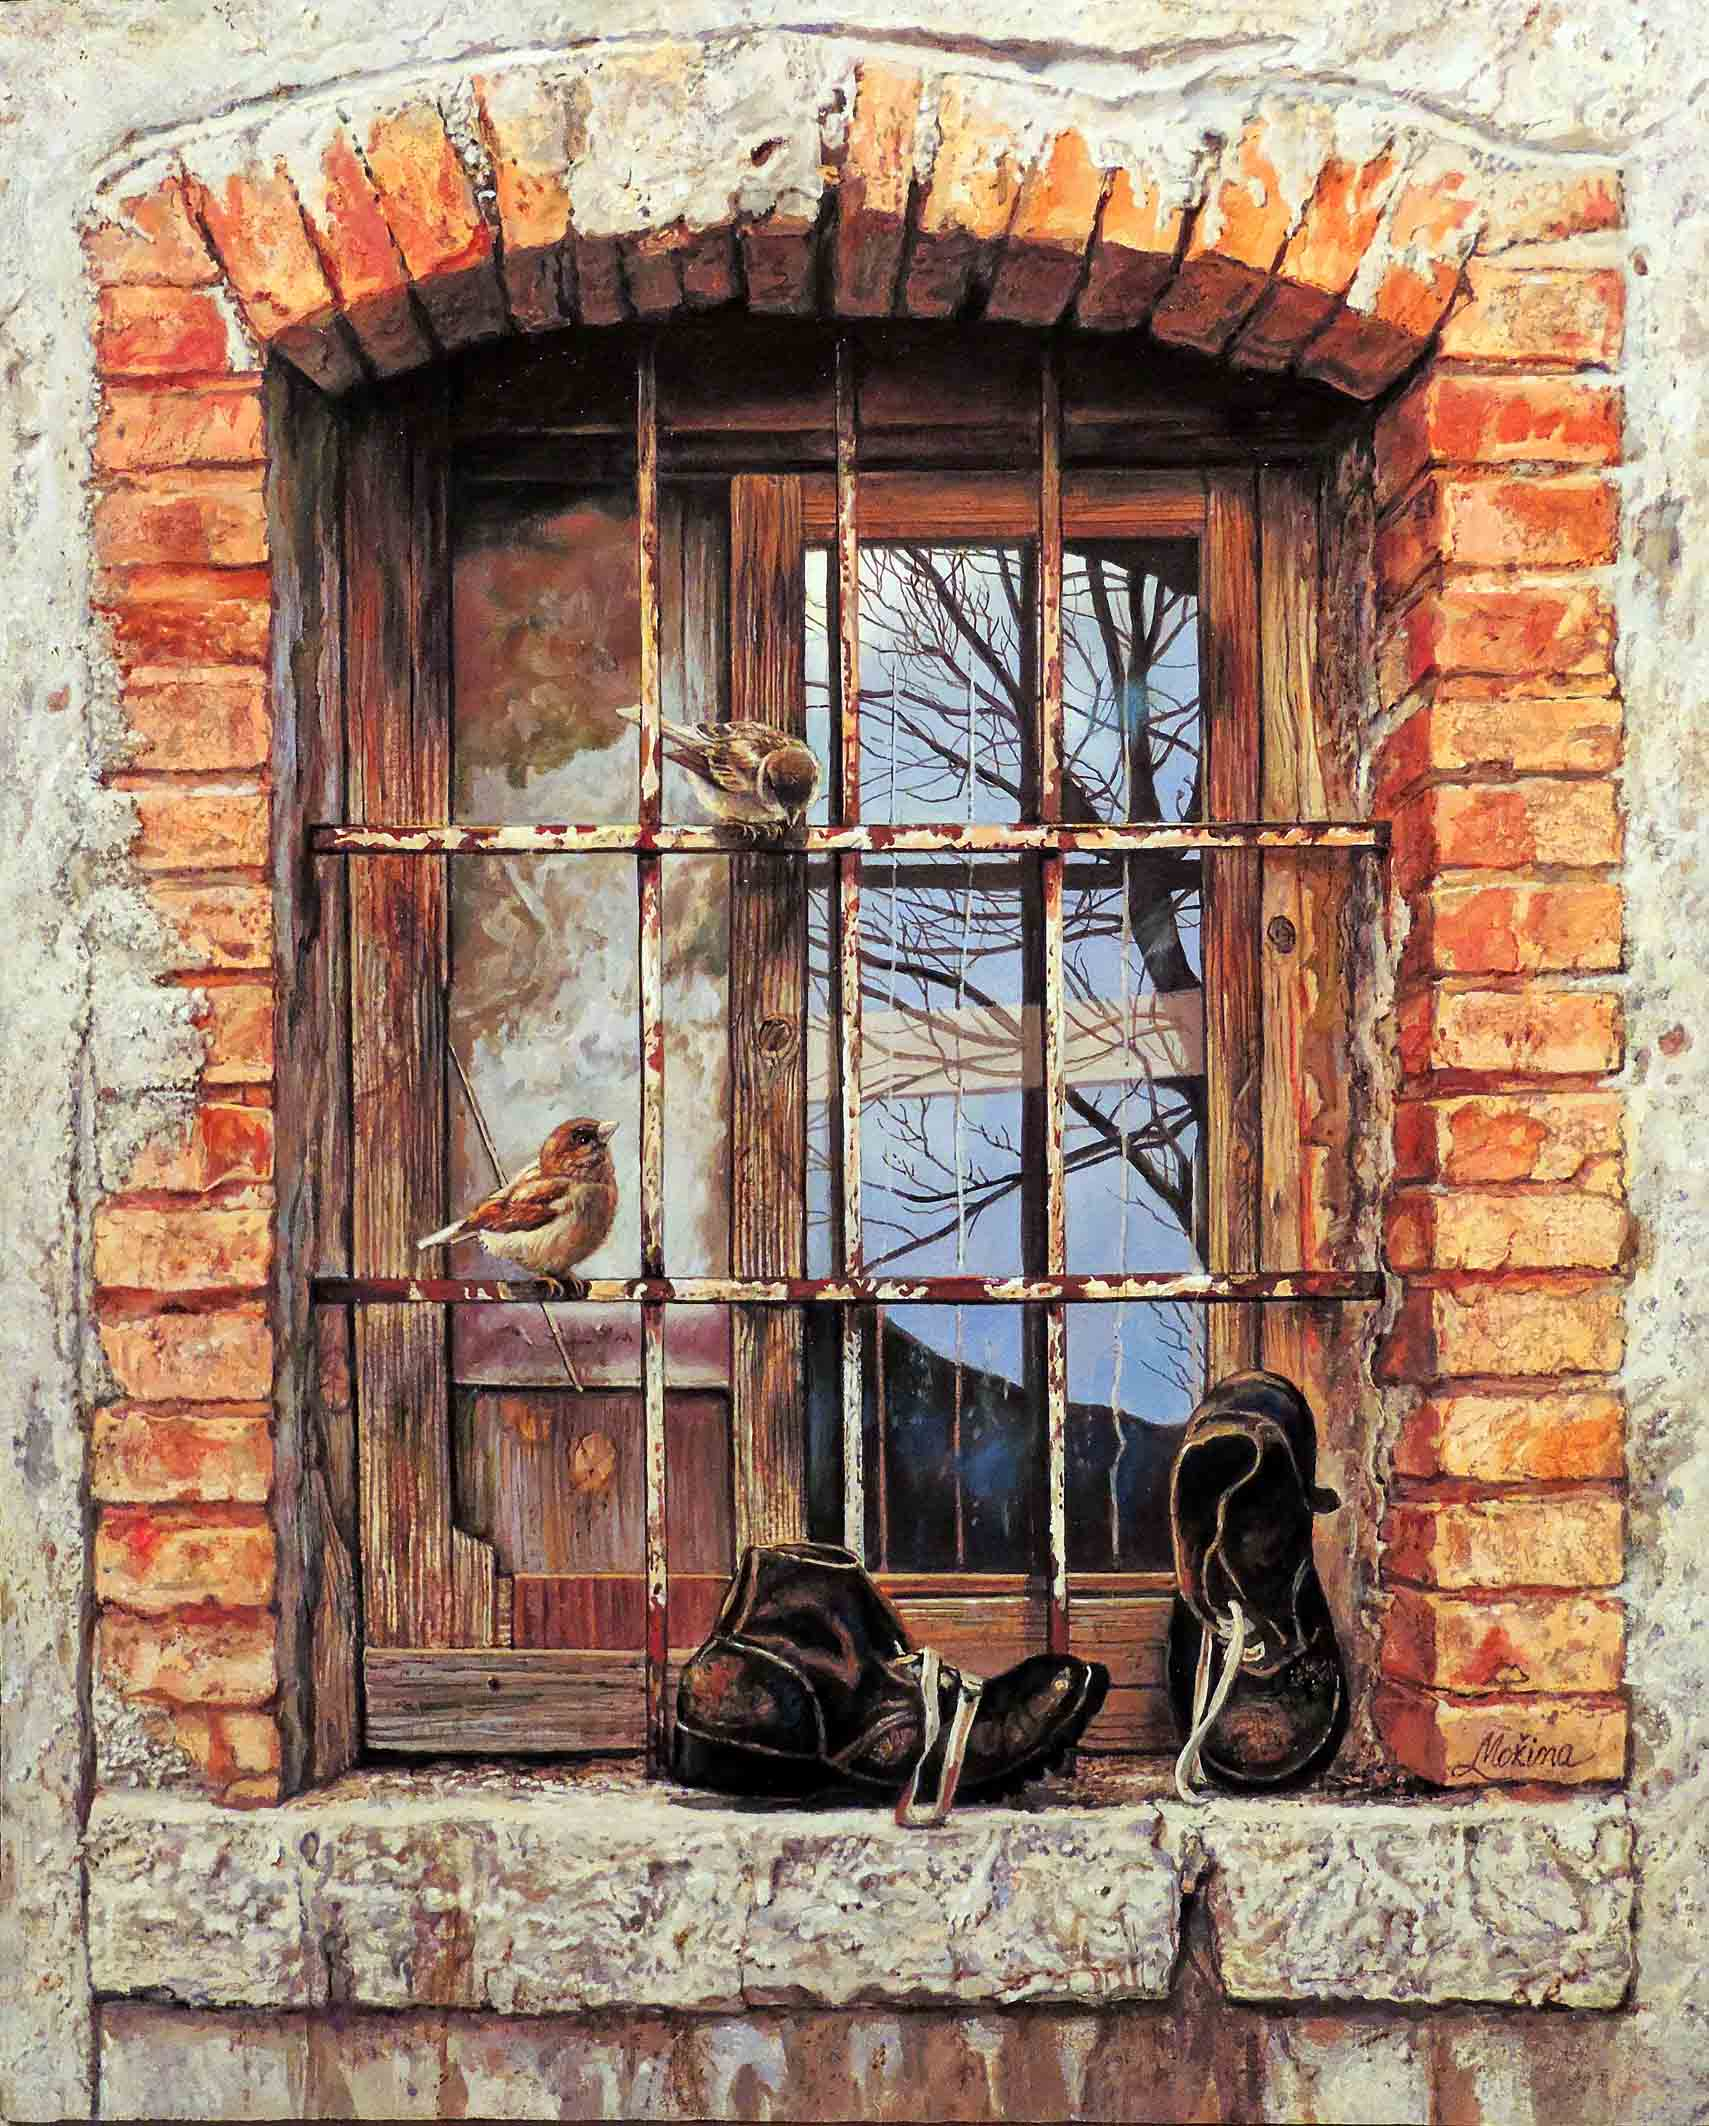 Livio Možina - Passerotti (olio su tavola, 43x35 cm)